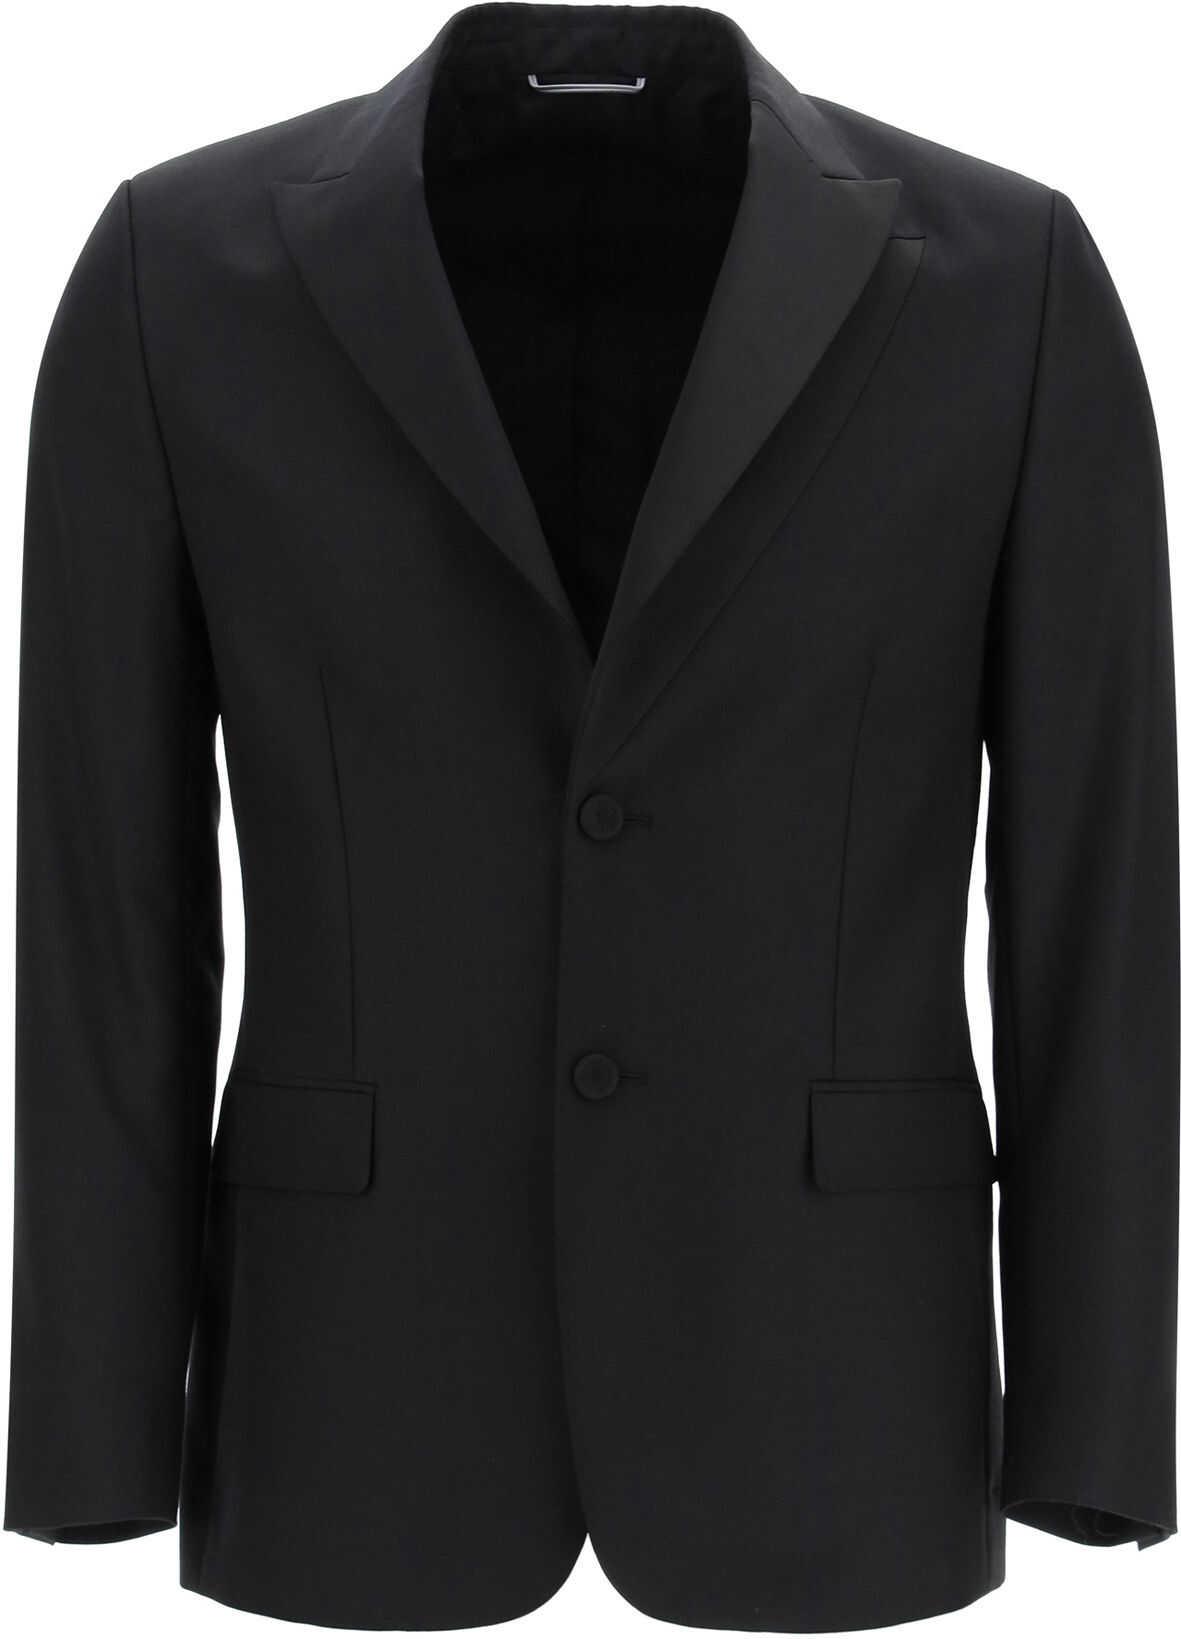 Dior Wool And Mohair Natte' Blazer BLACK imagine